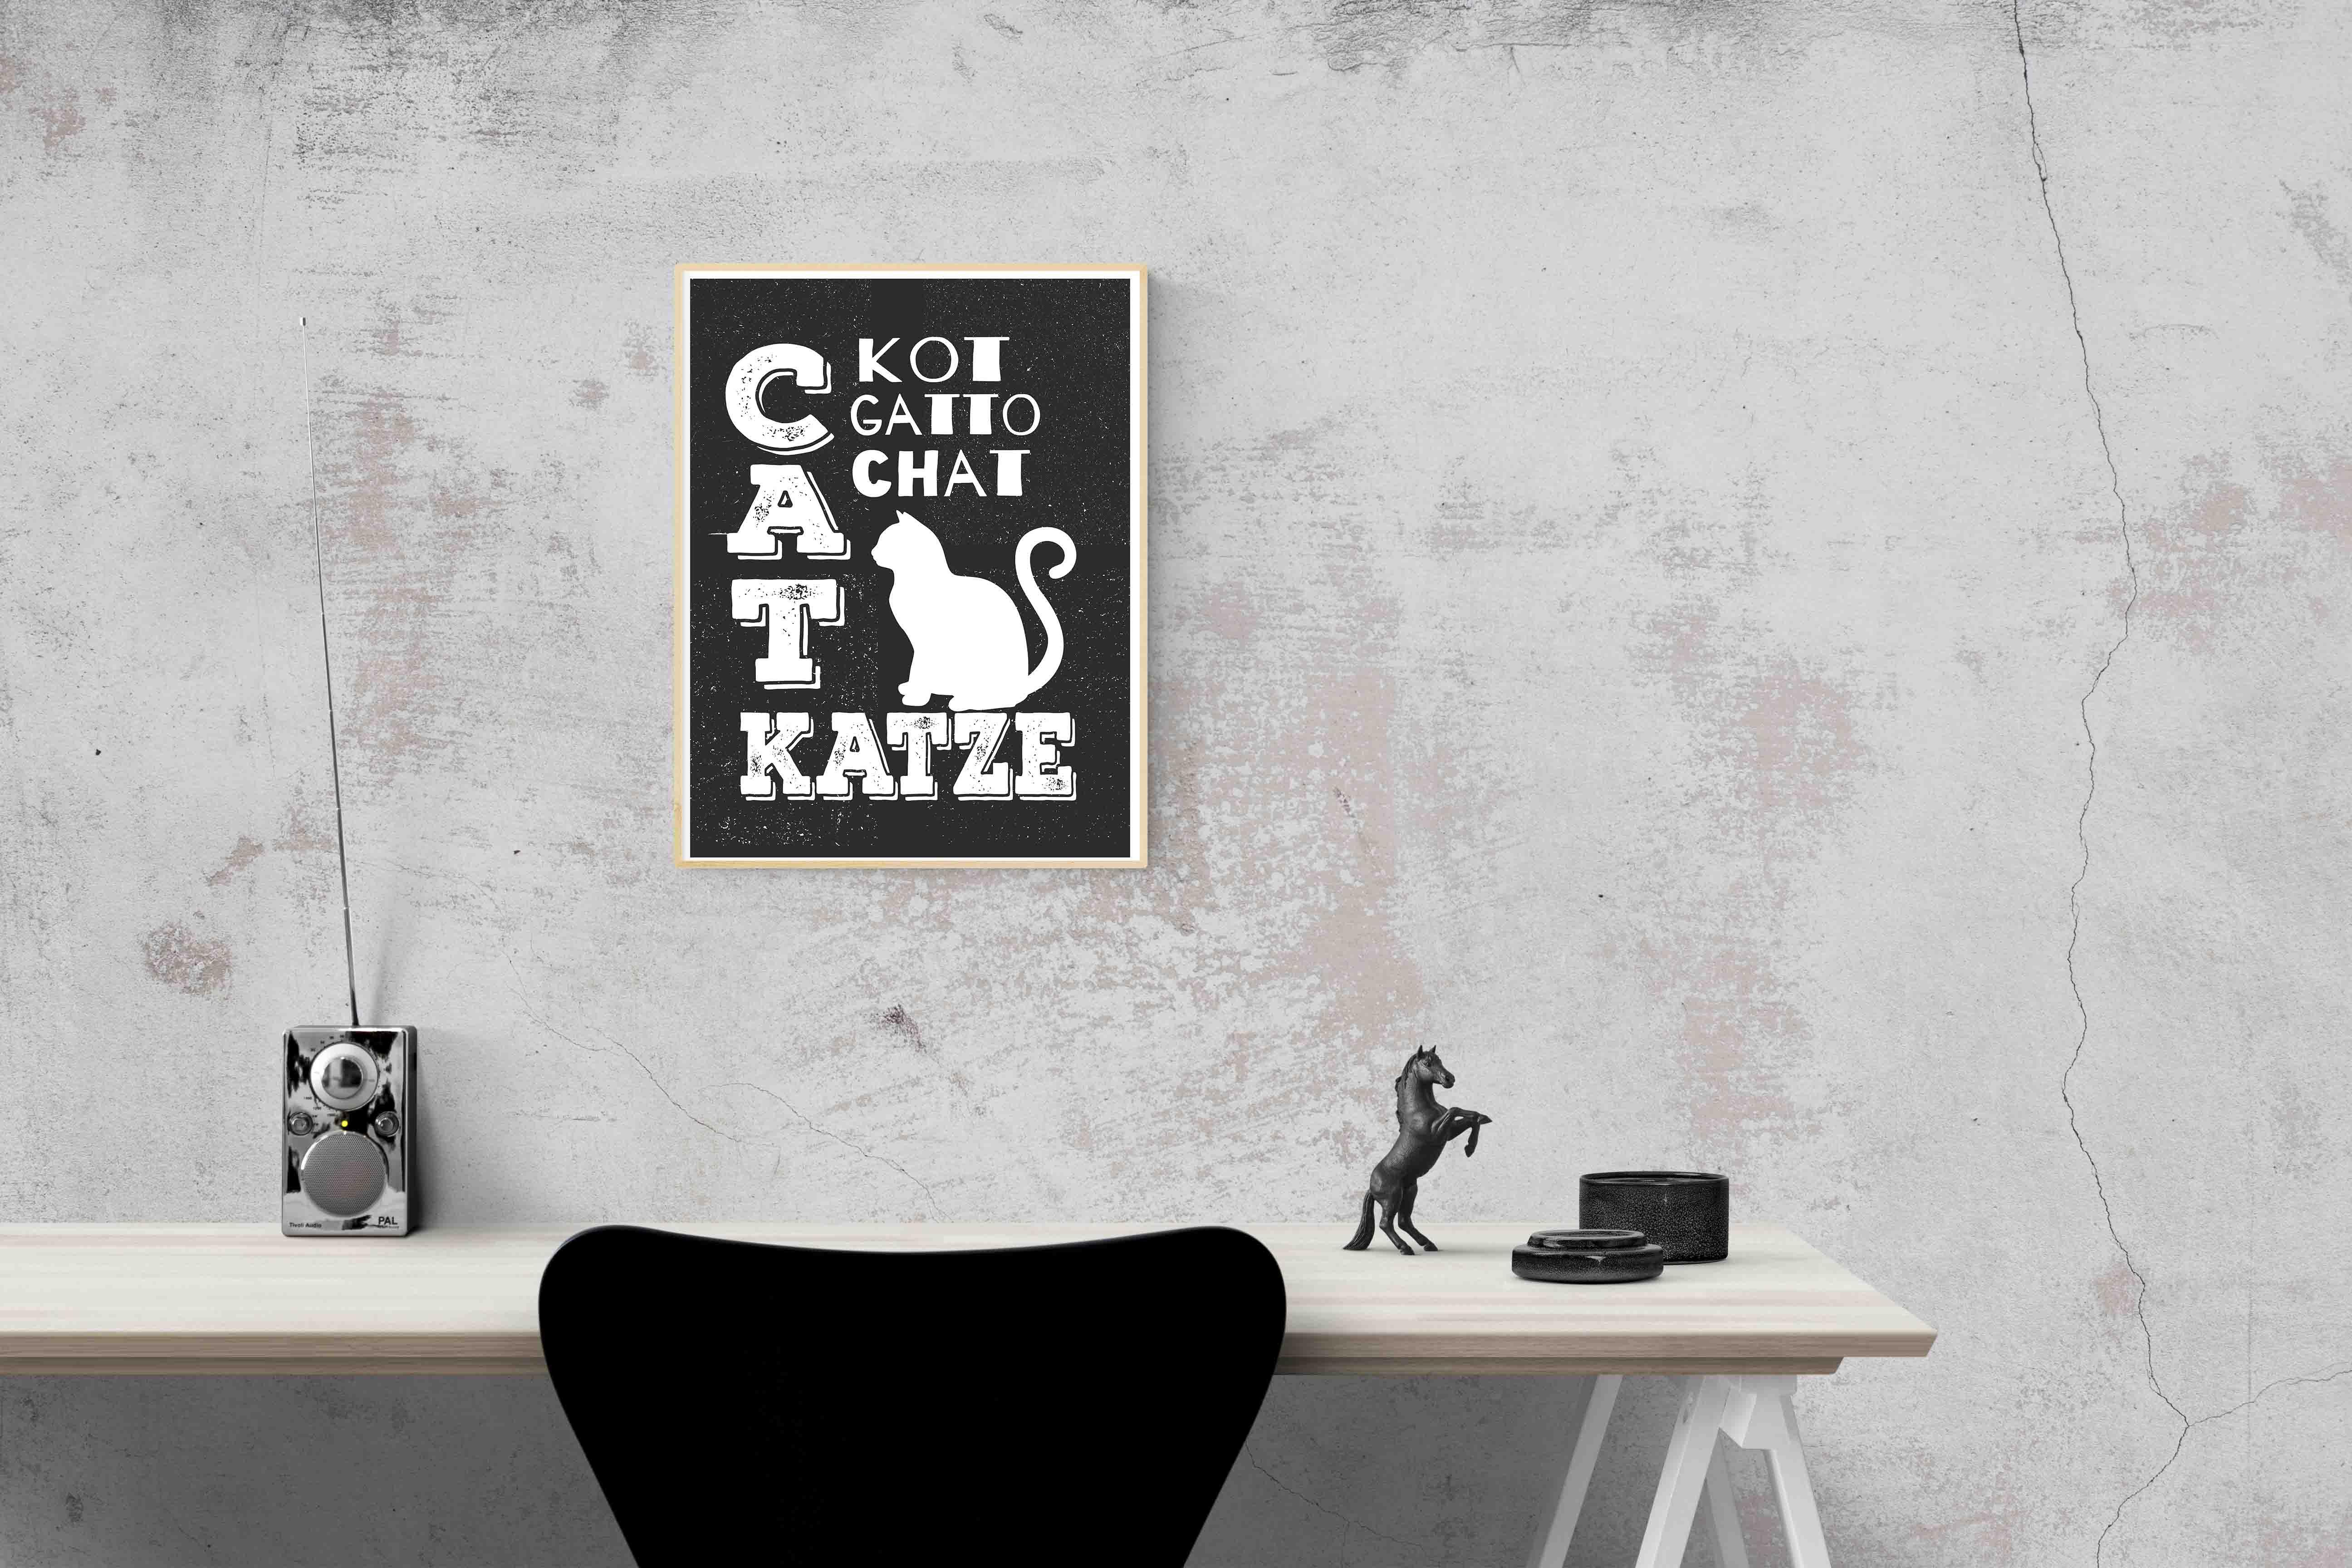 Plakat Napisy O Kotach Grafika Czarno Biała